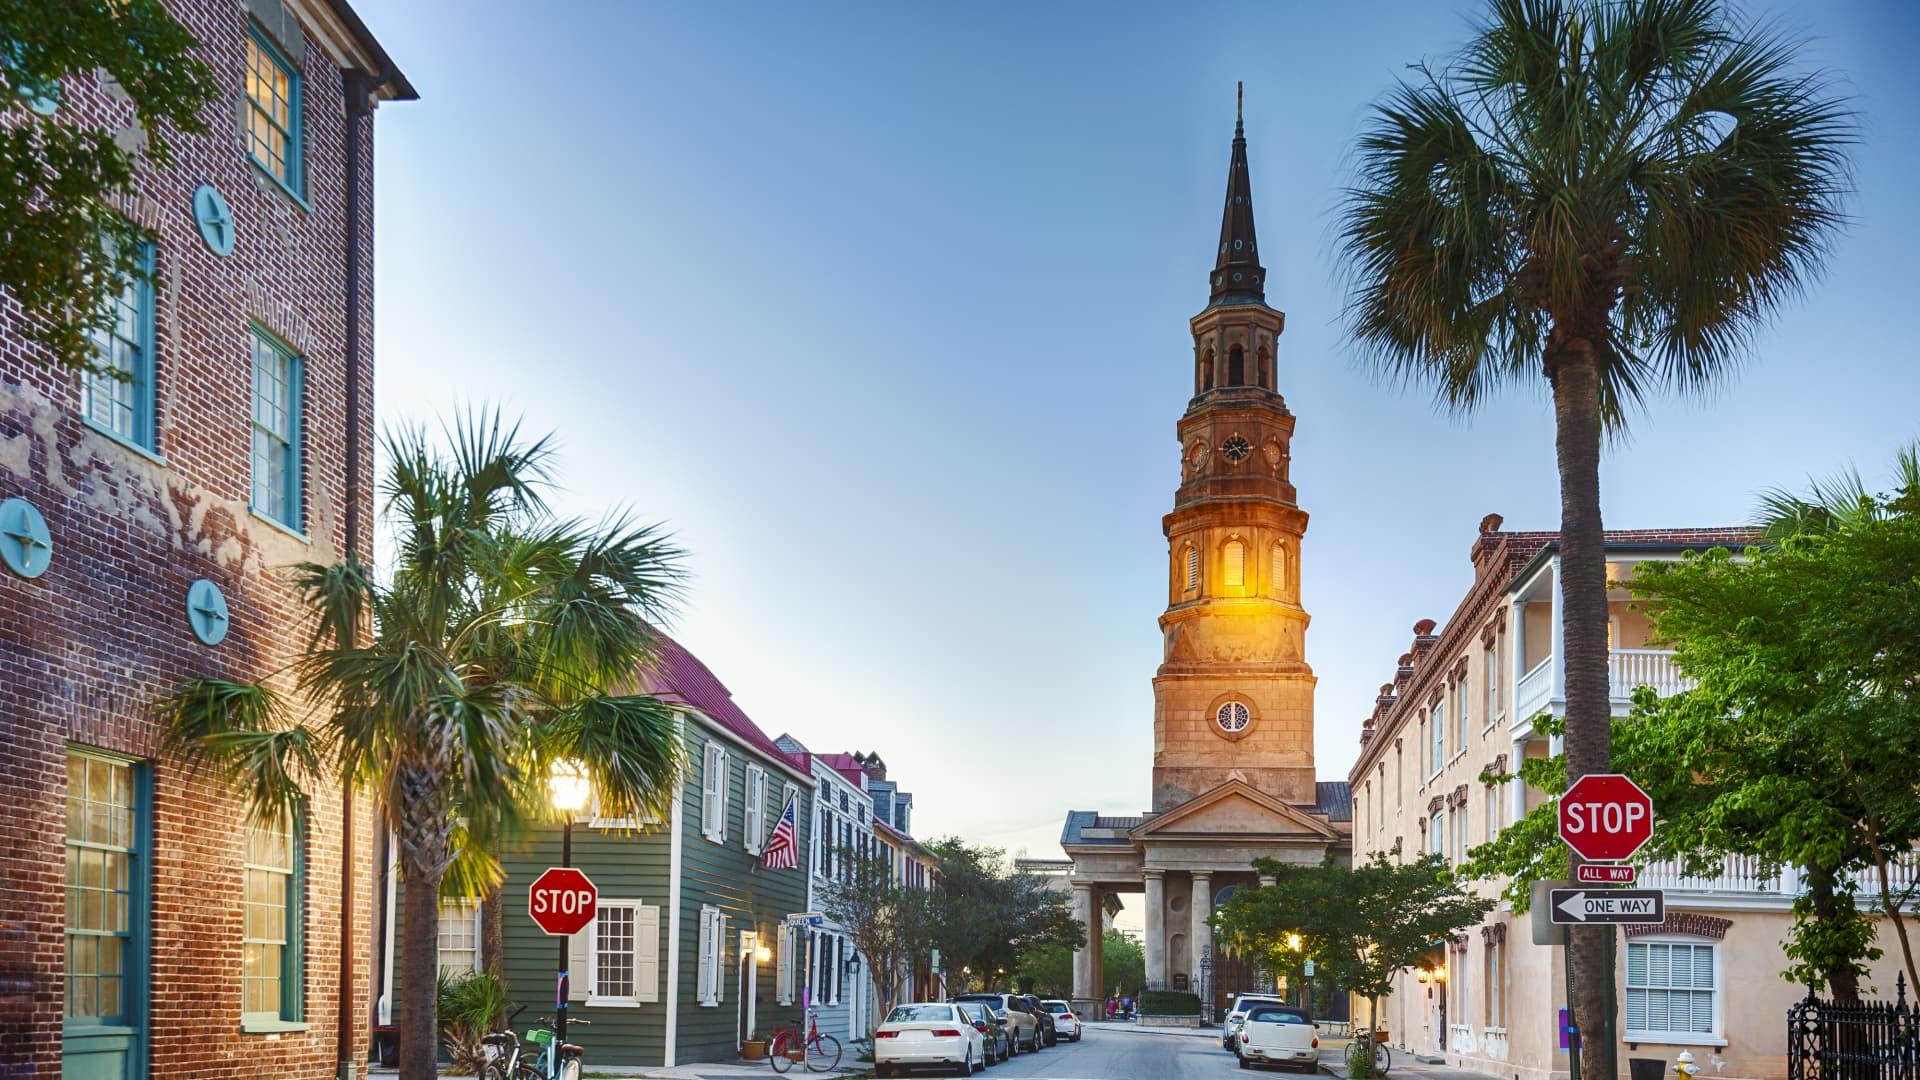 Charleston, South Carolina, was named No. 1 U.S. destination for 2021 by Travel + Leisure magazine.